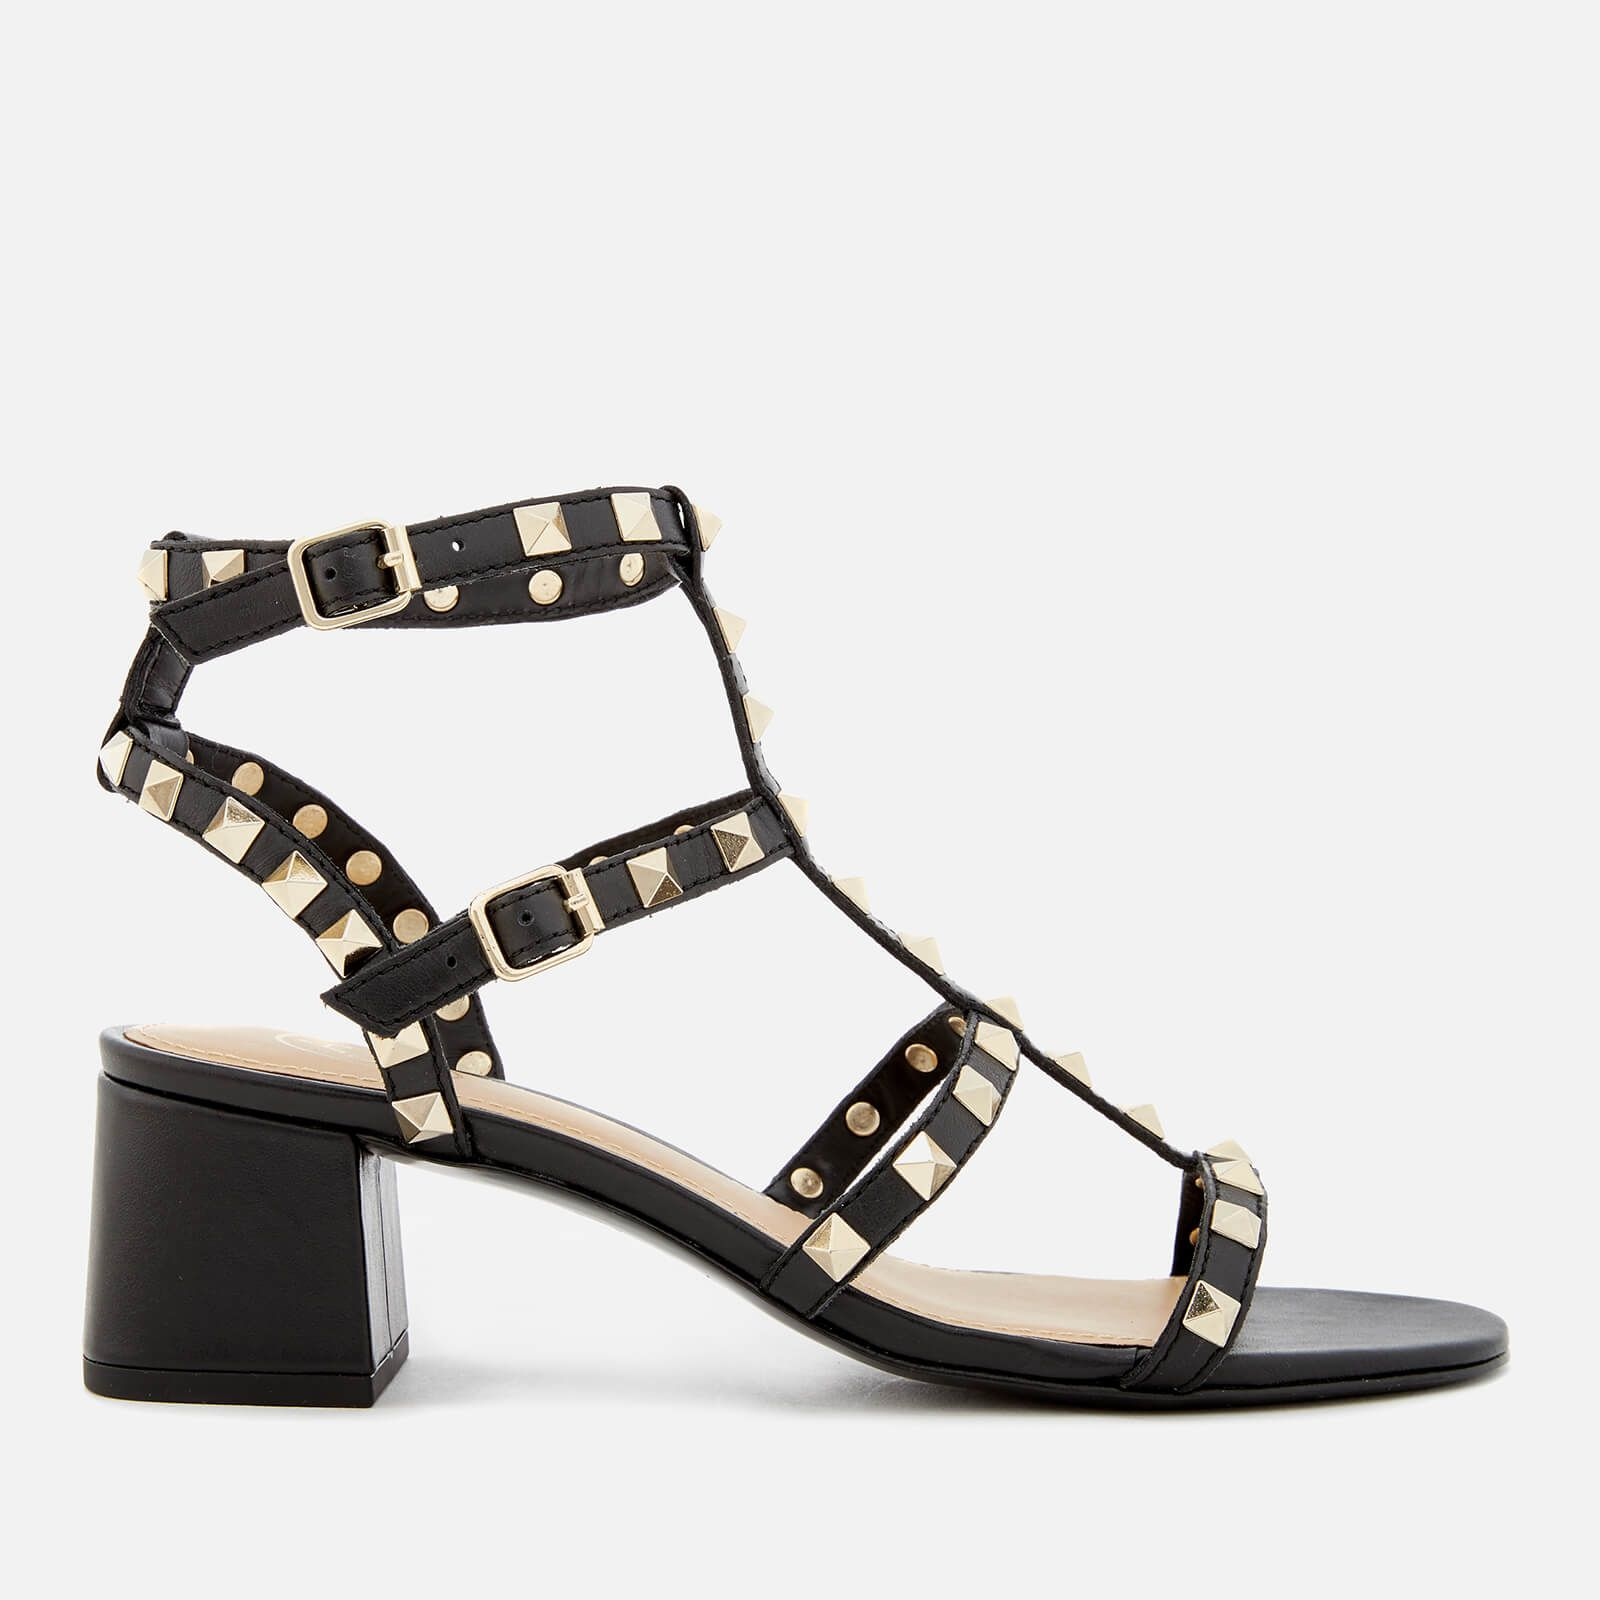 Ash Women's Rolling Studded Blocked Heeled Sandals Black